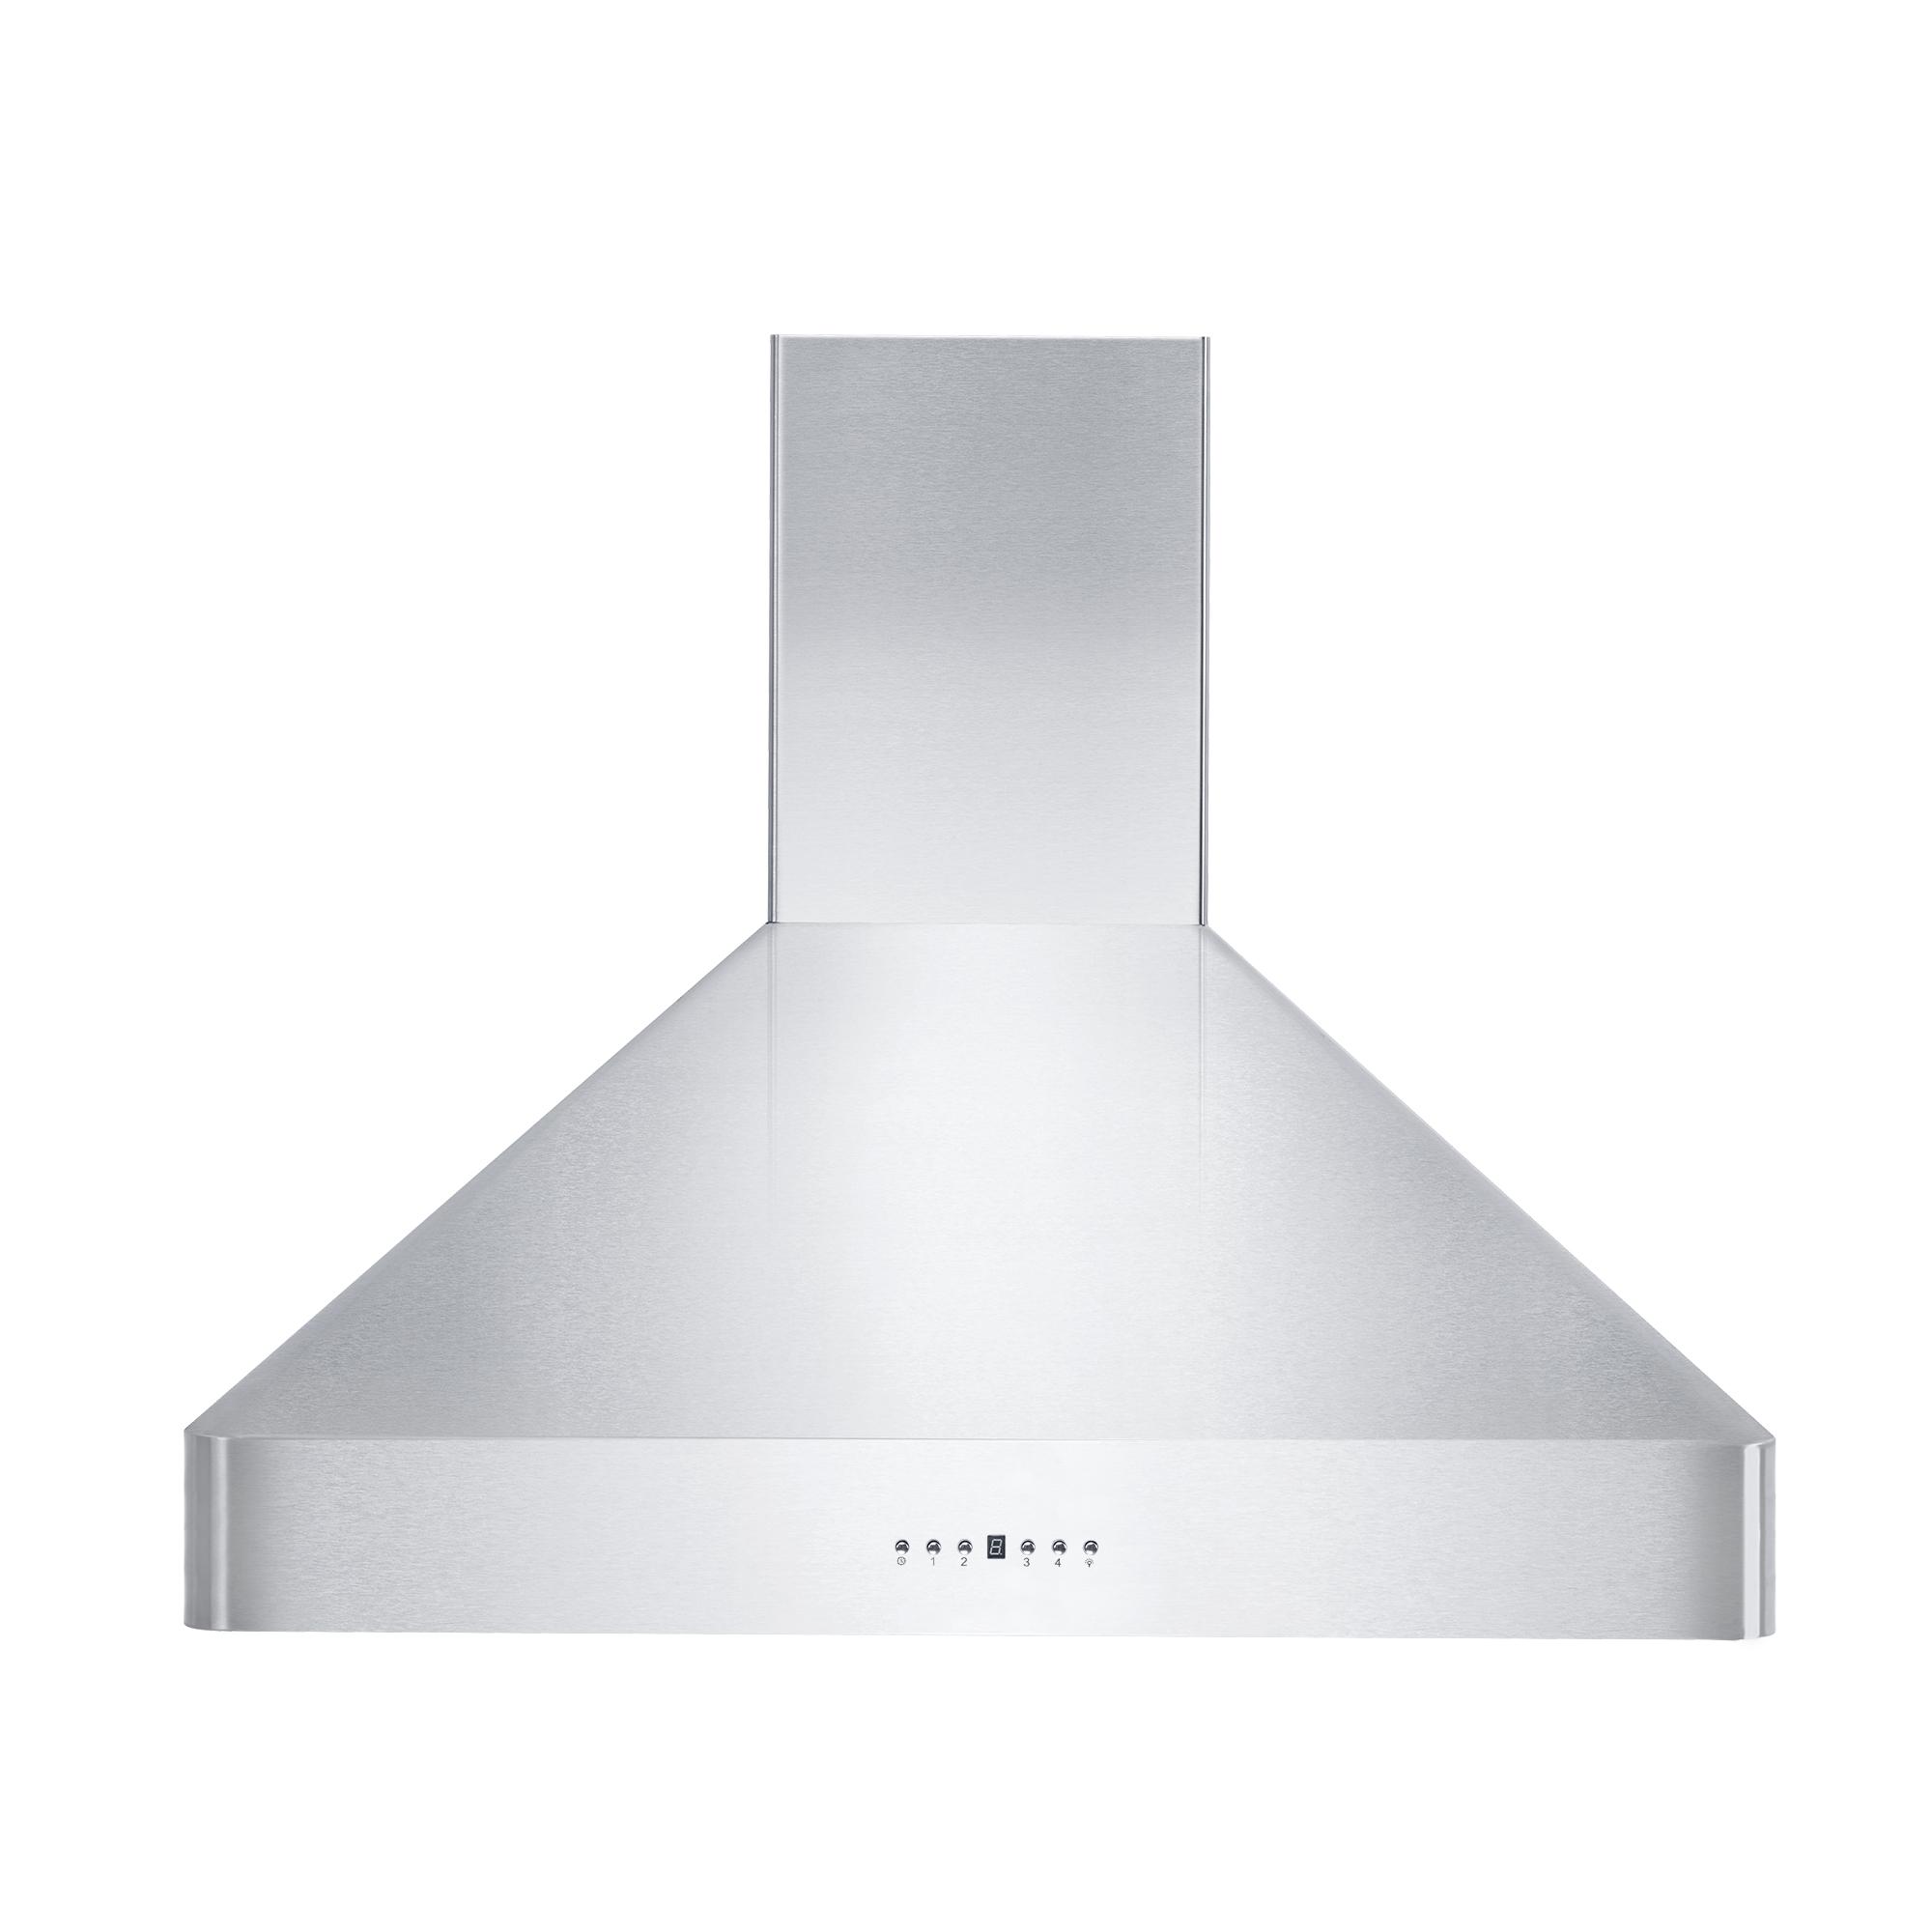 zline-stainless-steel-wall-mounted-range-hood-kf2-new-front.jpg